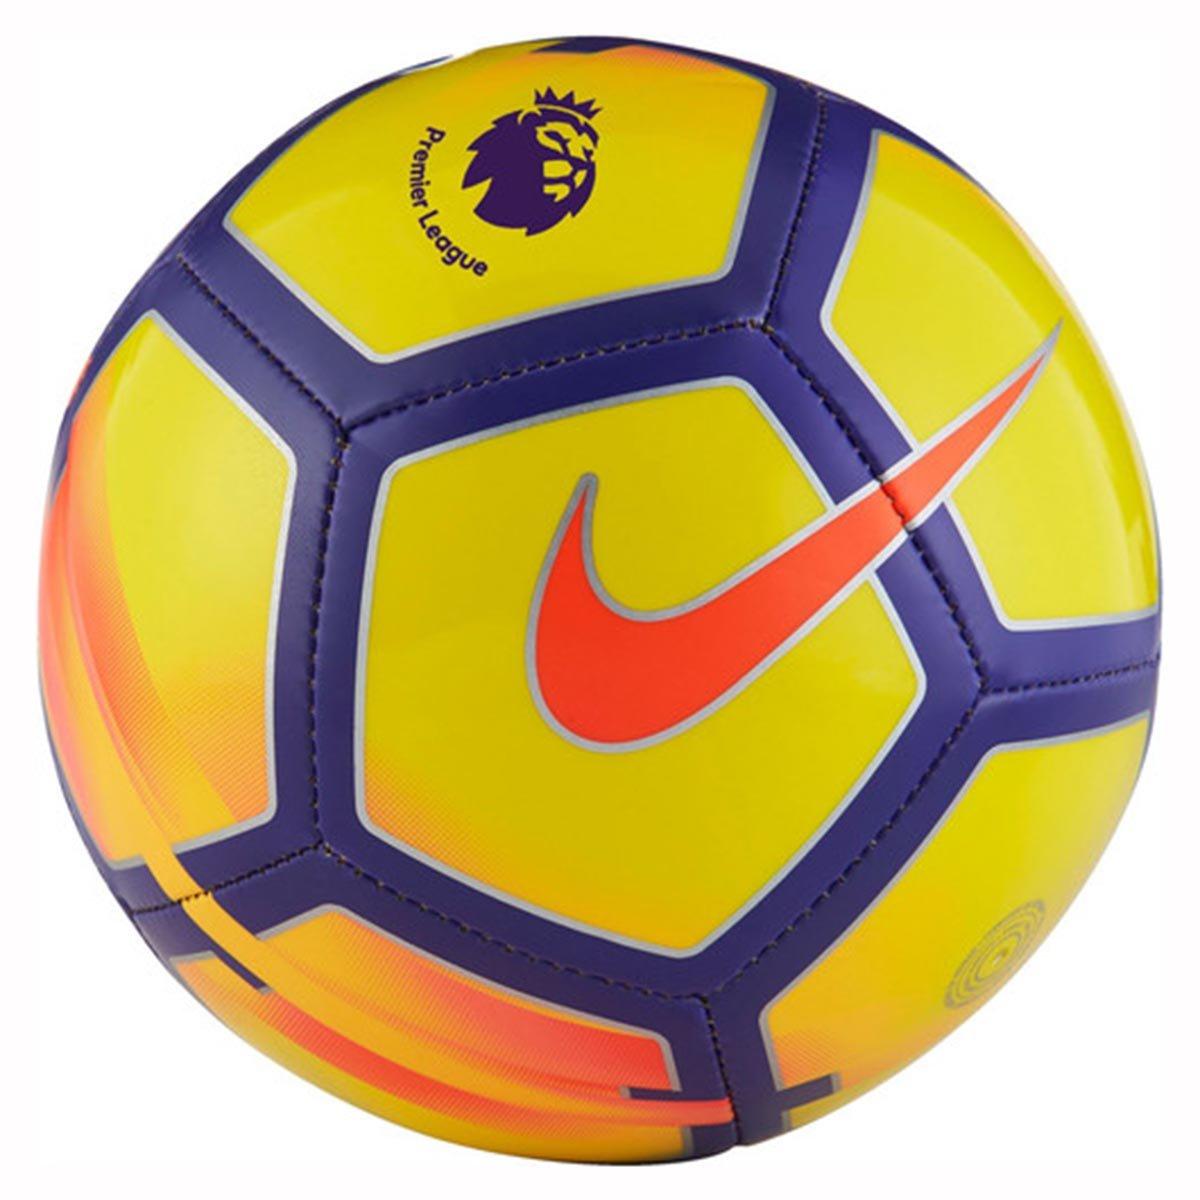 Buy Nike Pitch Premier League Football (Yellow Purple) Online c8c53c24958